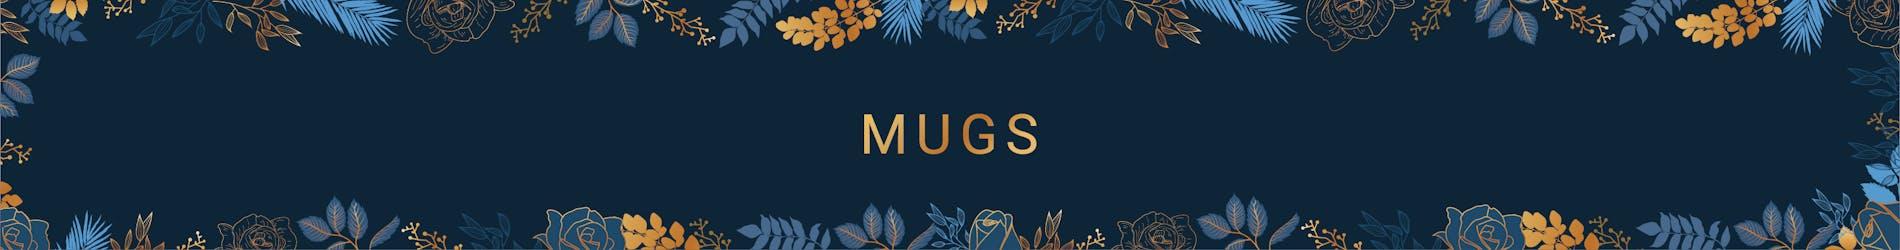 Personalised Mugs | Printed Mugs | Funny, Unique & Novelty Mugs | Gift Mugs